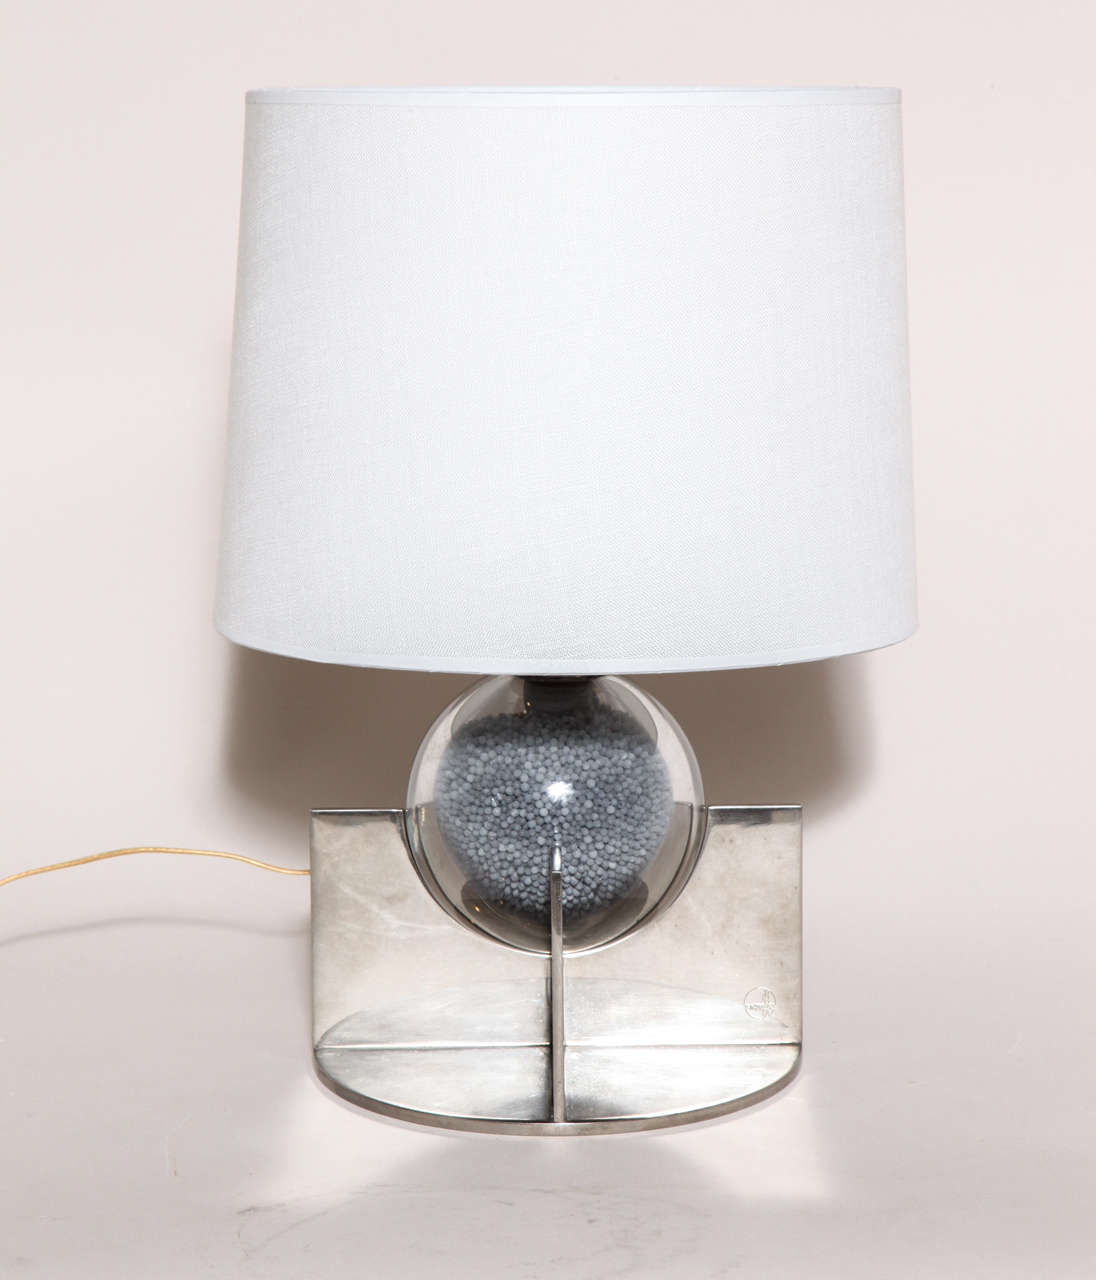 Boris jean lacroix art deco table lamp for sale at 1stdibs for Ardeco pellet